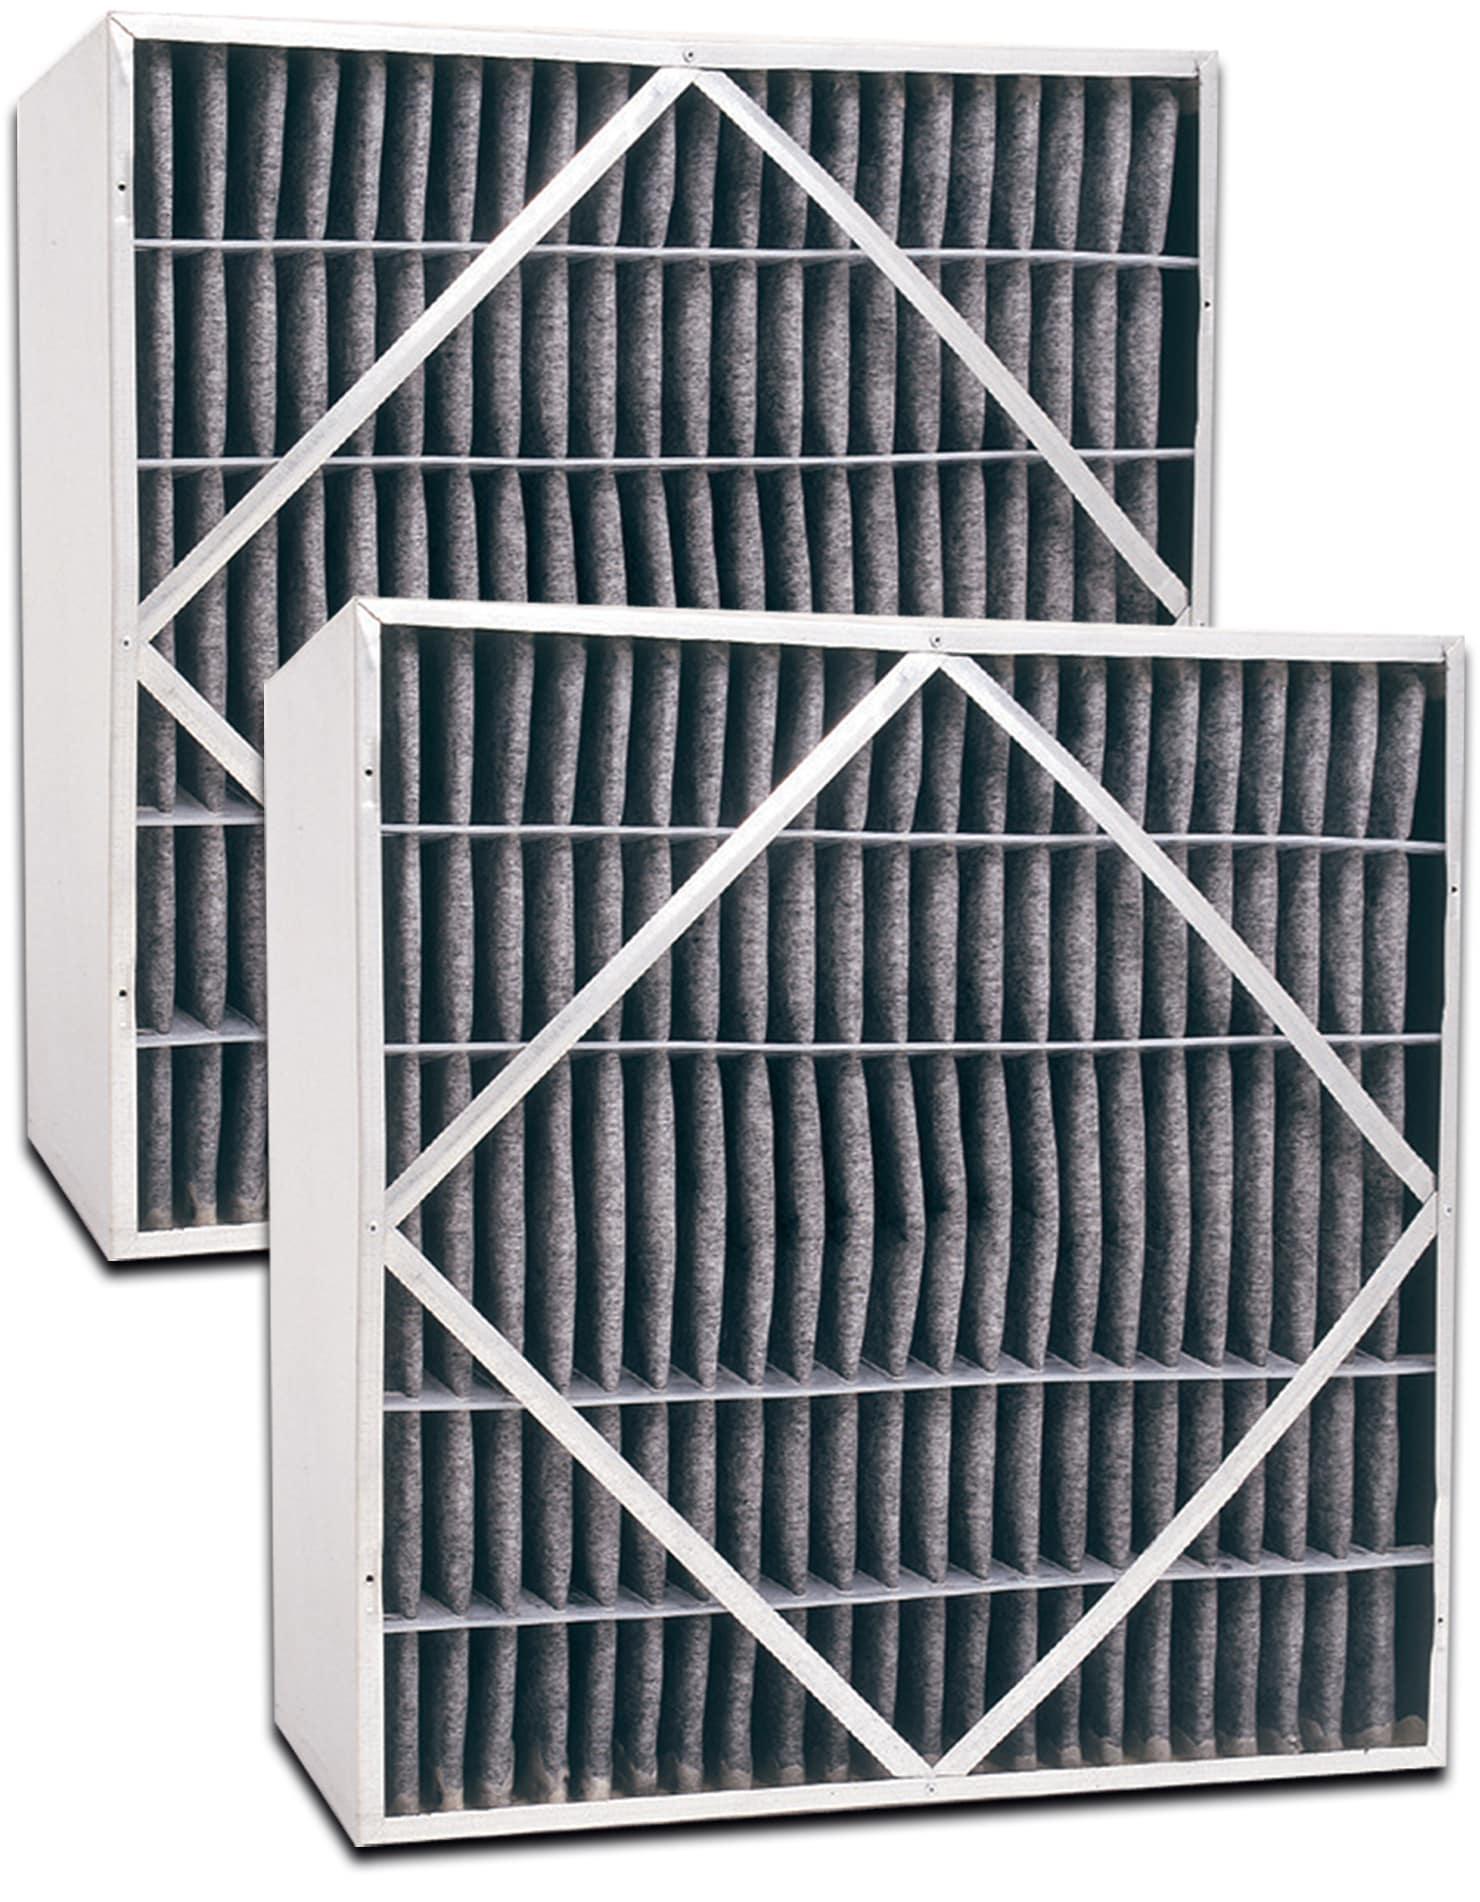 Purolator Carbon Box Air Filter